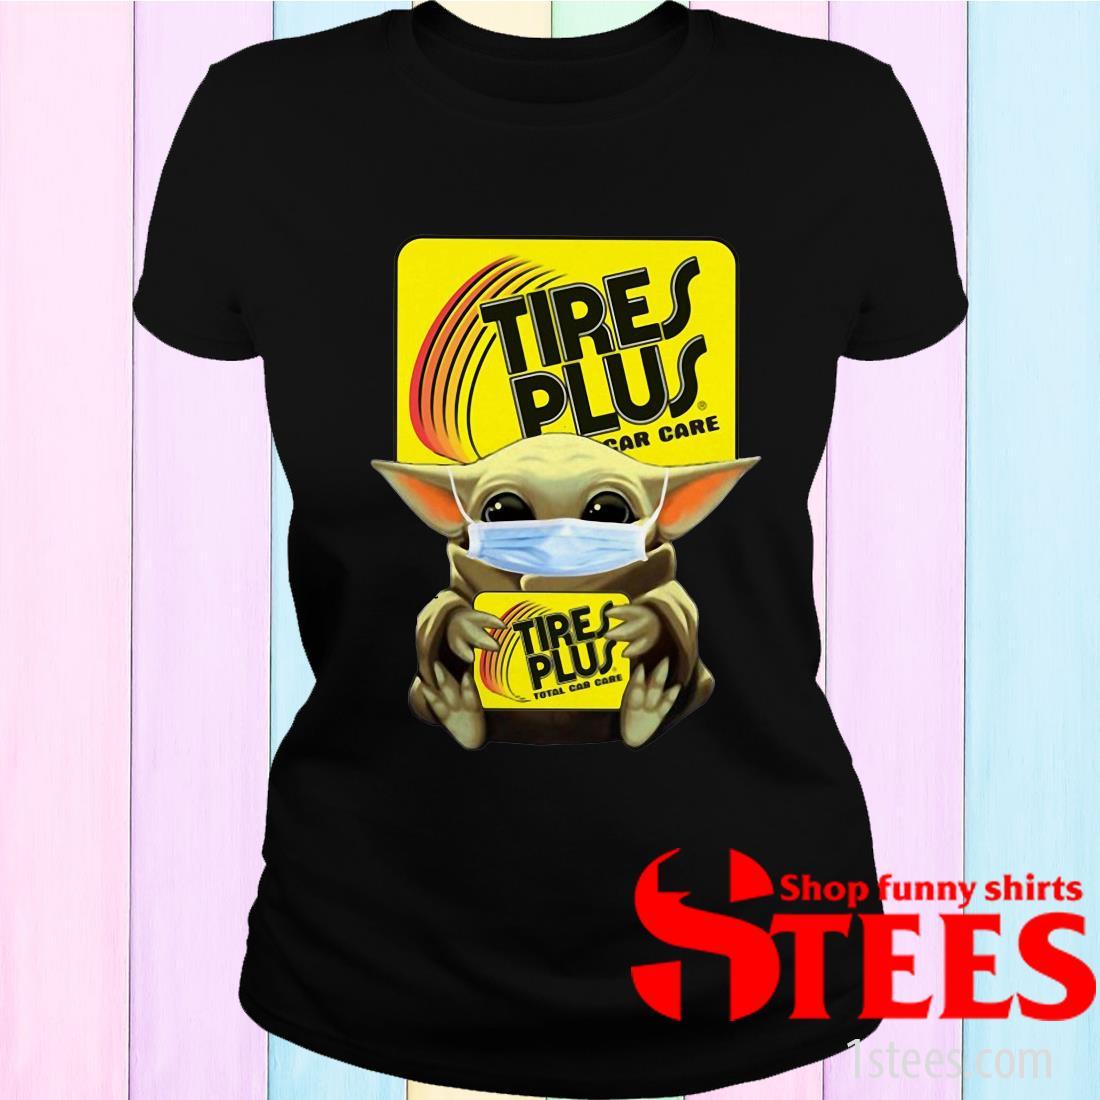 Star Wars Baby Yoda Hug Tires Plus Total Car Care Covid-19 Women's T-Shirt